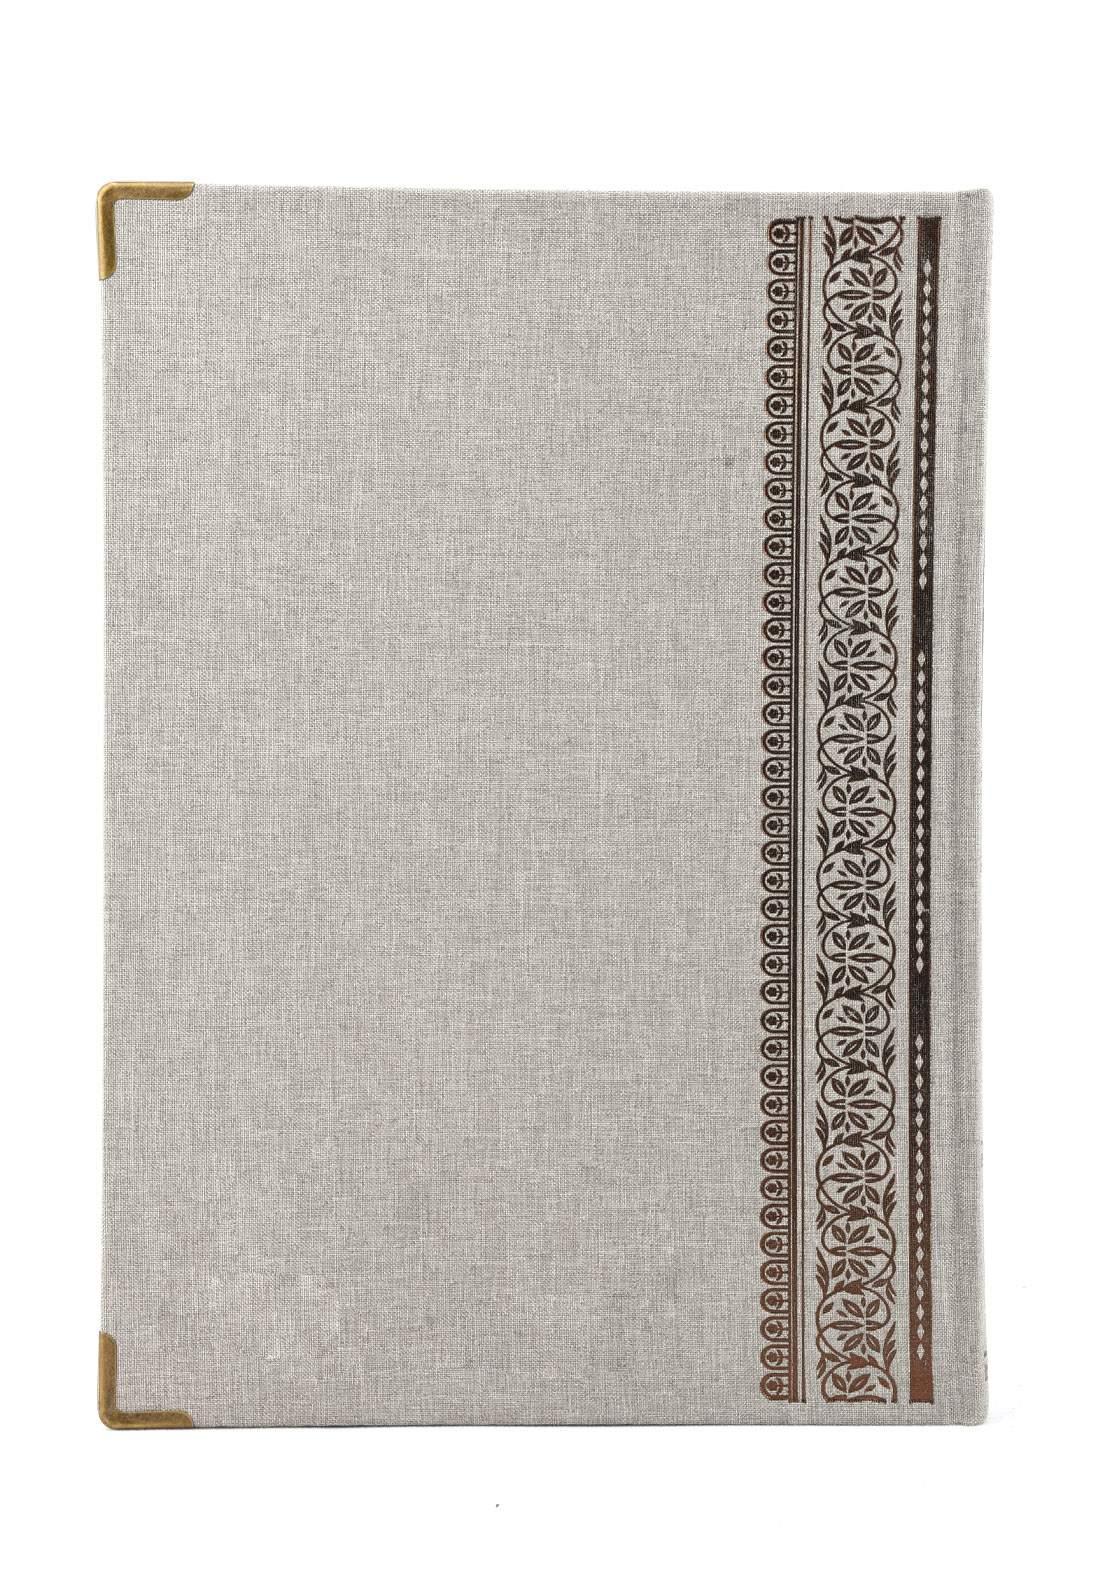 Tarsi (1438-2007 )160 Sheets Drawing Book دفتر رسم تارسي 160ورقة